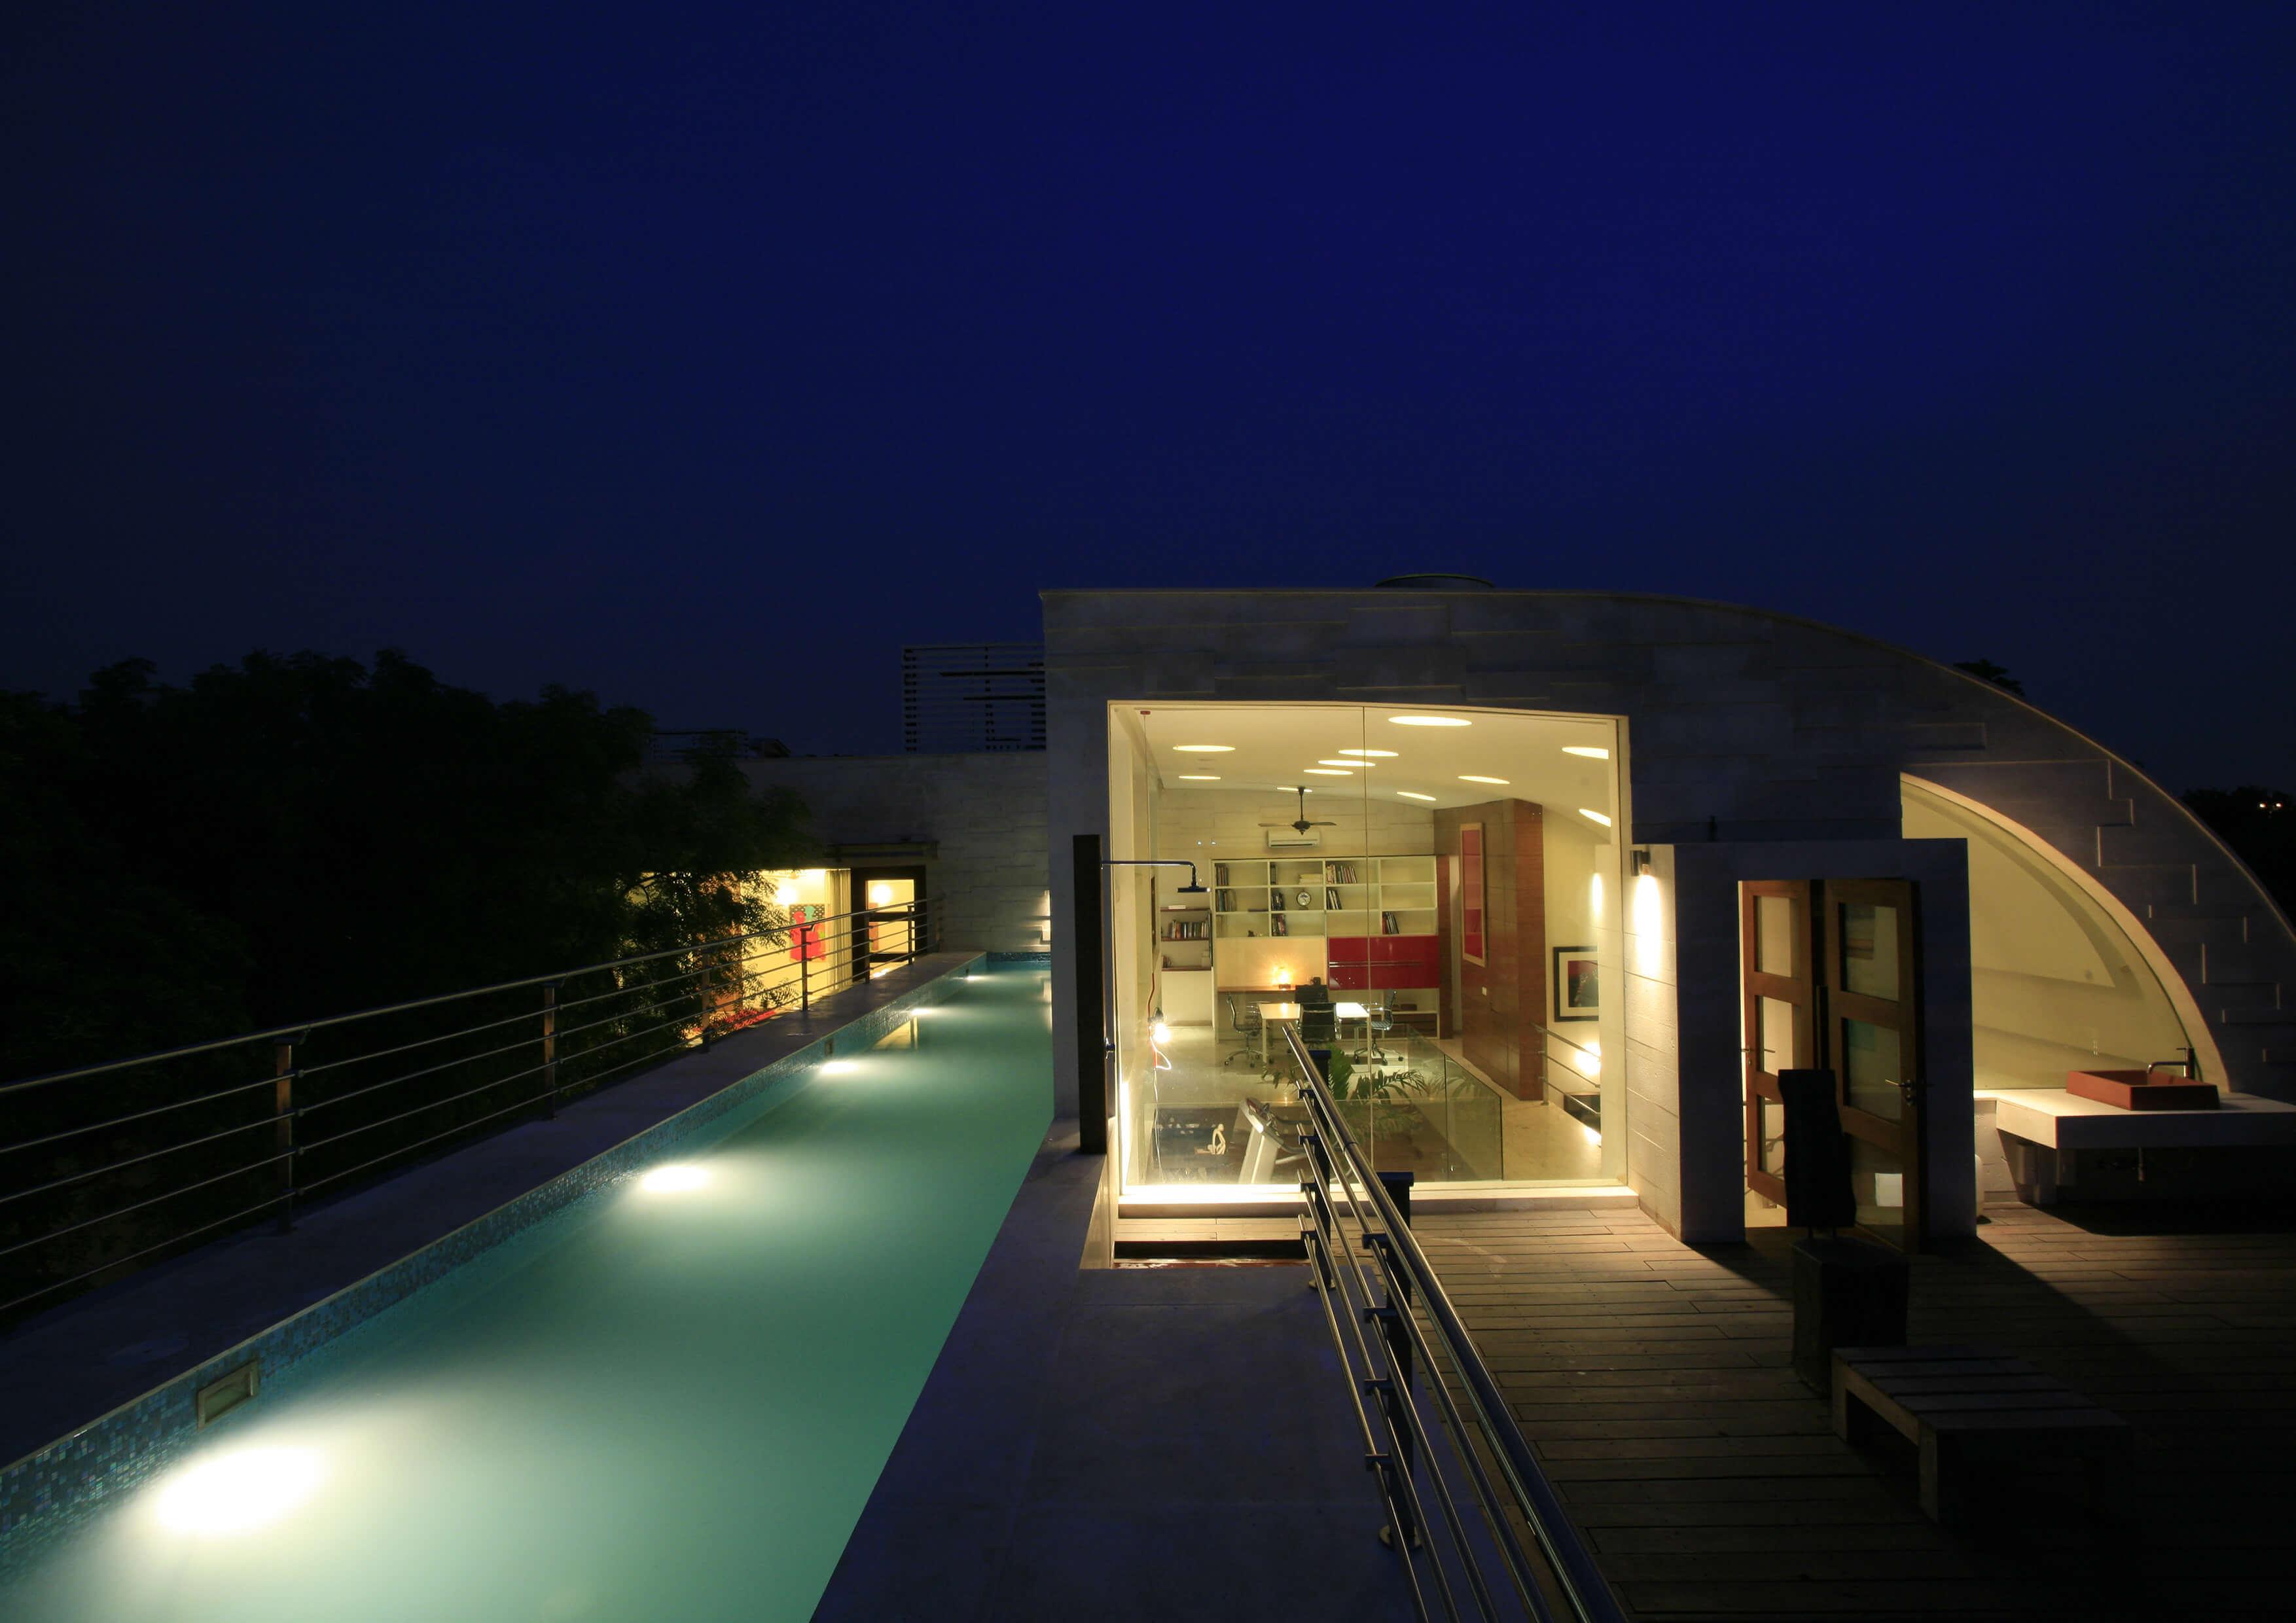 Architecture Design For Home In Delhi house architect in bangalore, delhi | india - morphogenesis